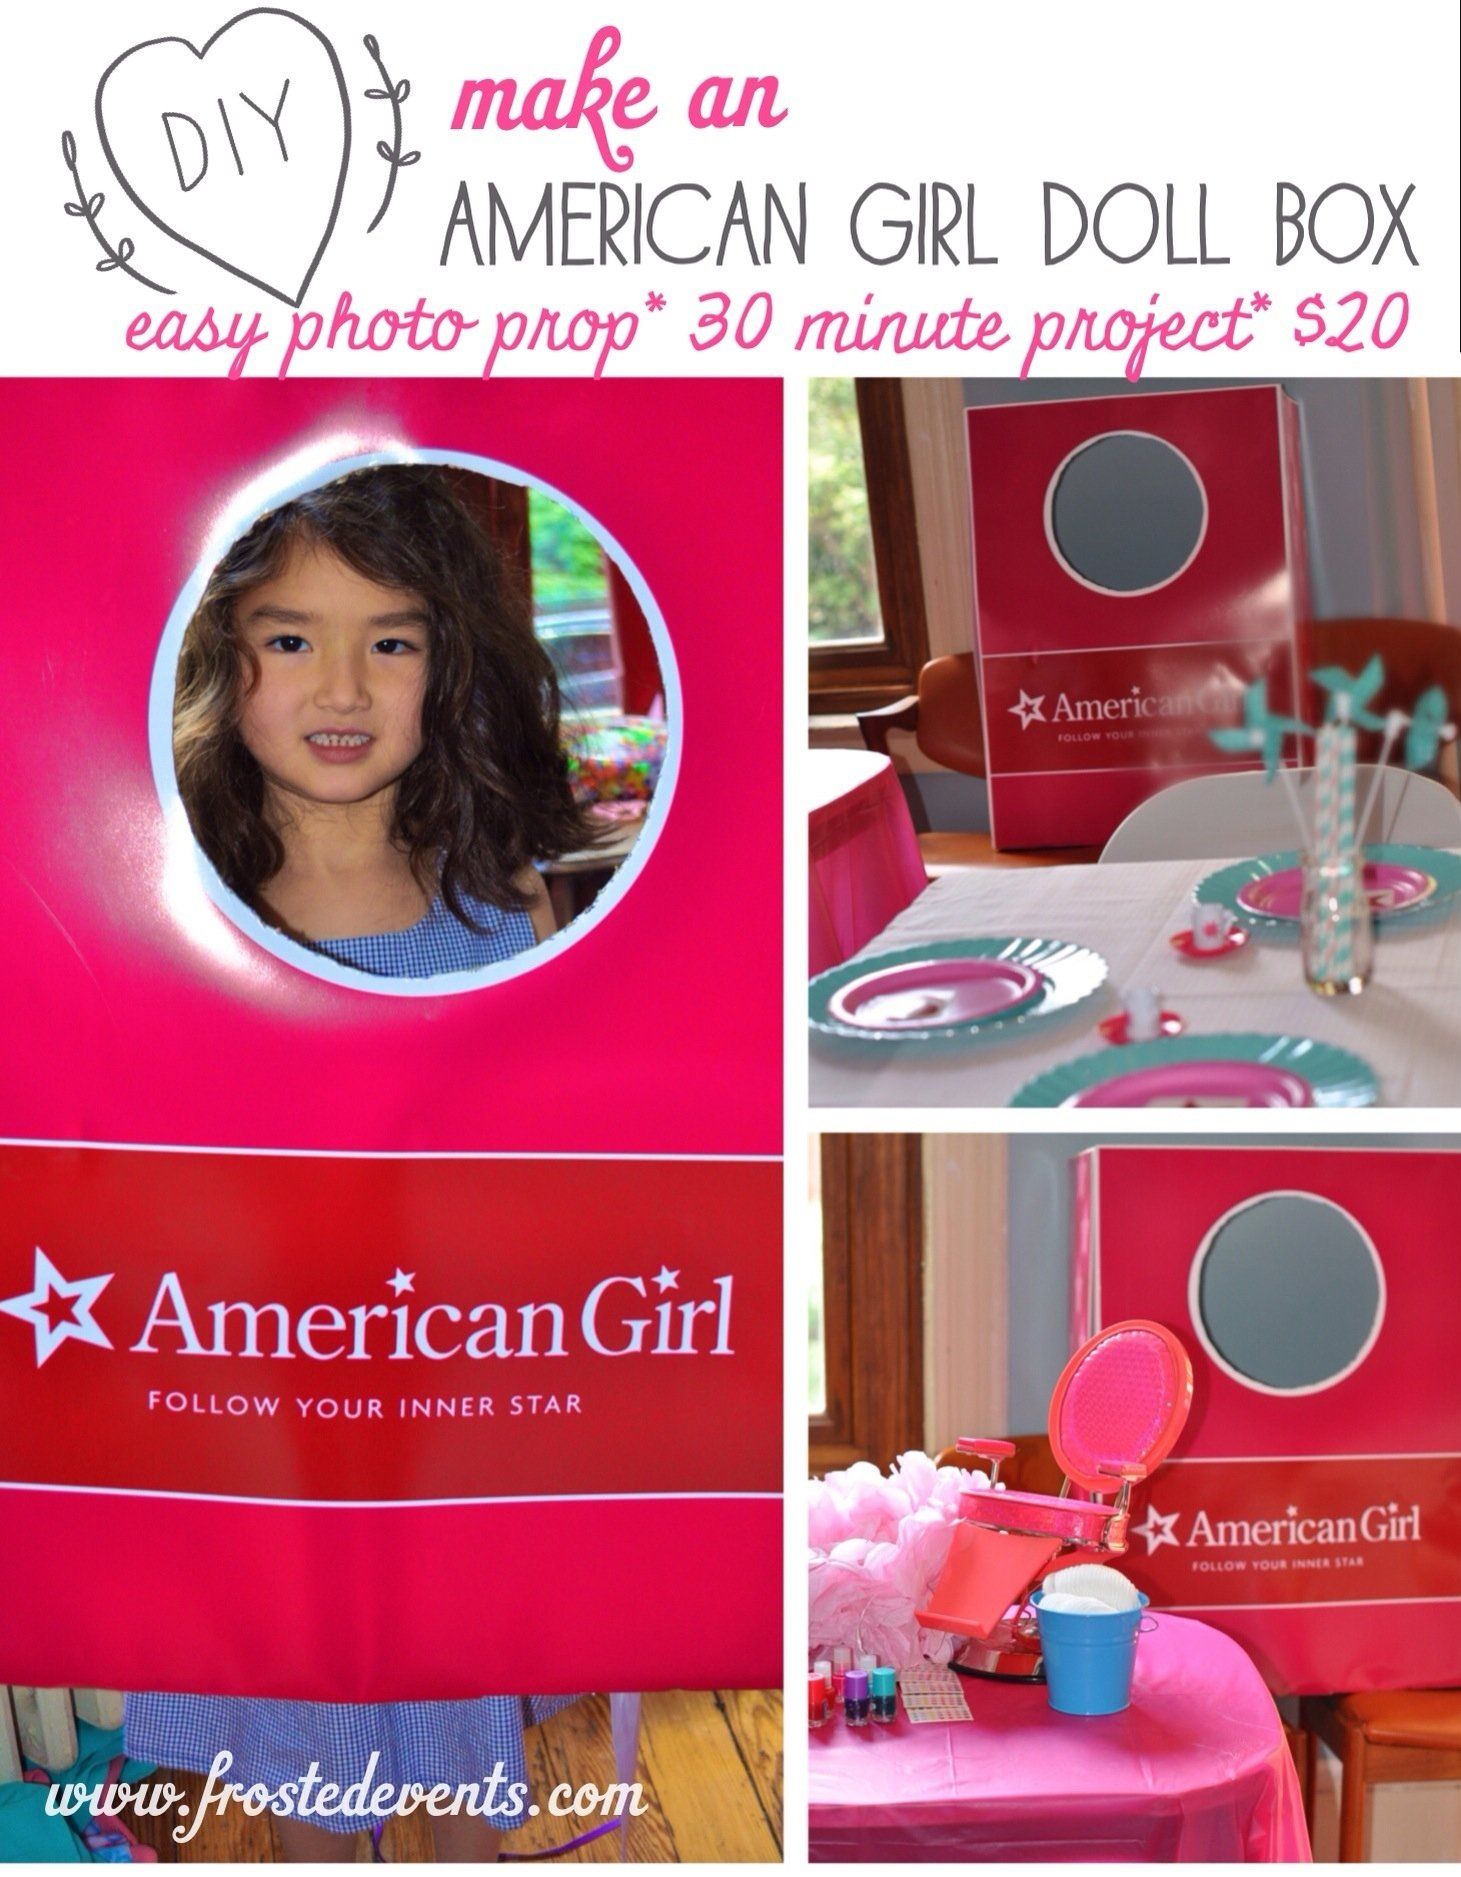 10 Spectacular American Girl Birthday Party Ideas american girl themed birthday party ideas parentmap 2020